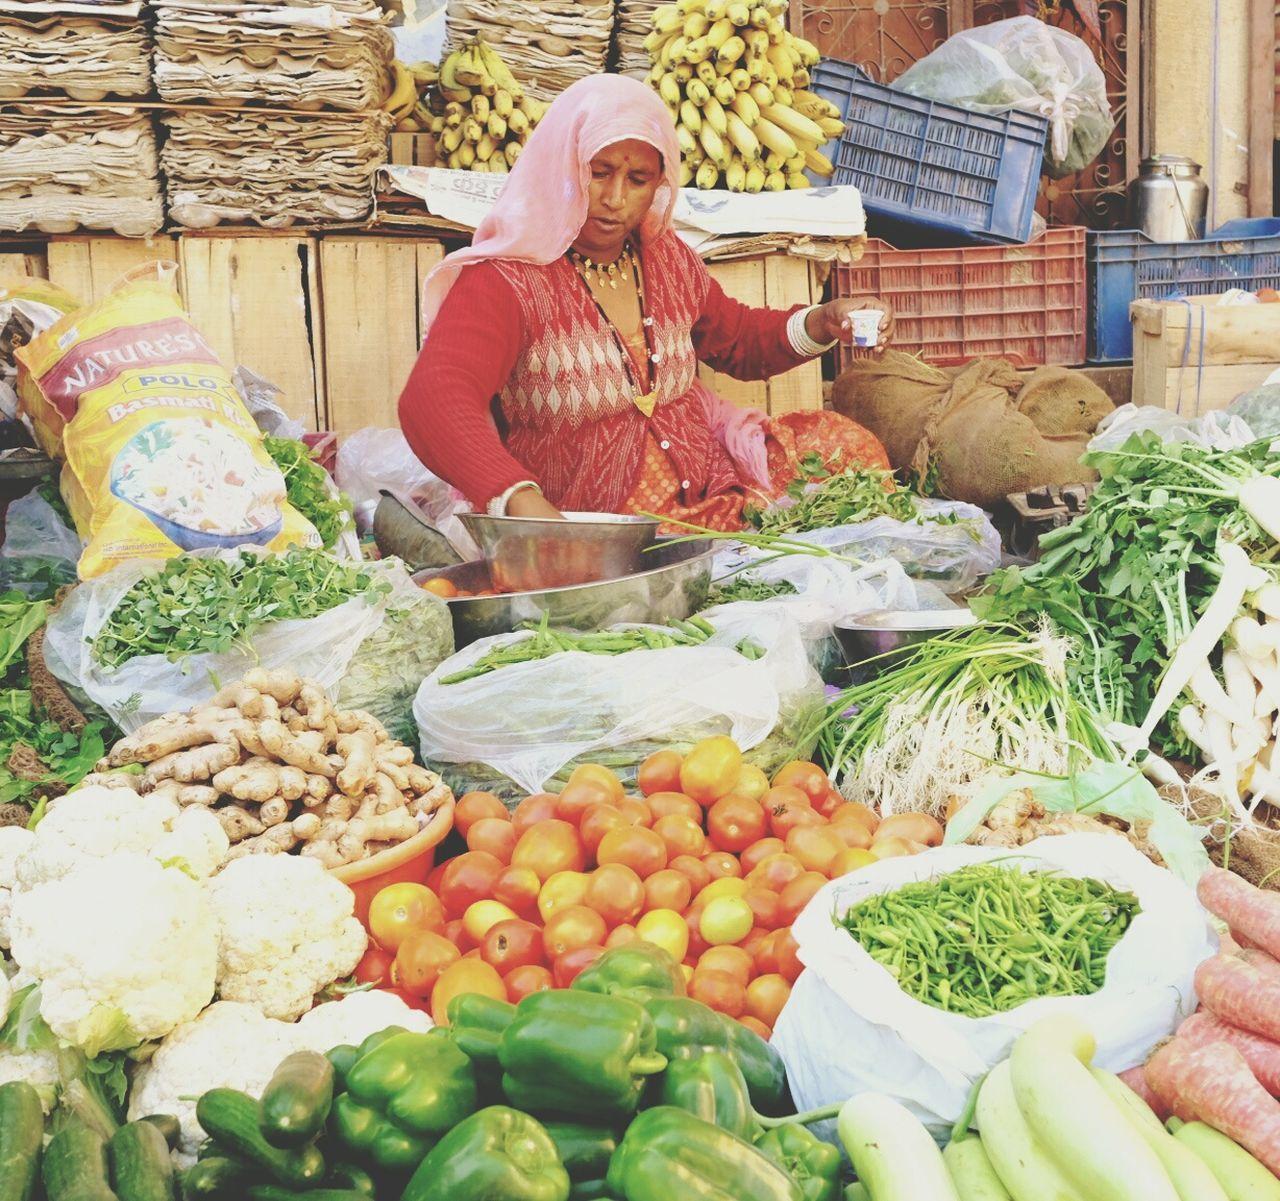 The Markets - Jaisalmer, India. Market Stall Travel Photography EyeEm Travel Photography See The World Through My Eyes Street Life Street Photography StreetphotographyStreet Market Fujifilm_xseries EyeEmBestPics Travel Destinations Travelphotography